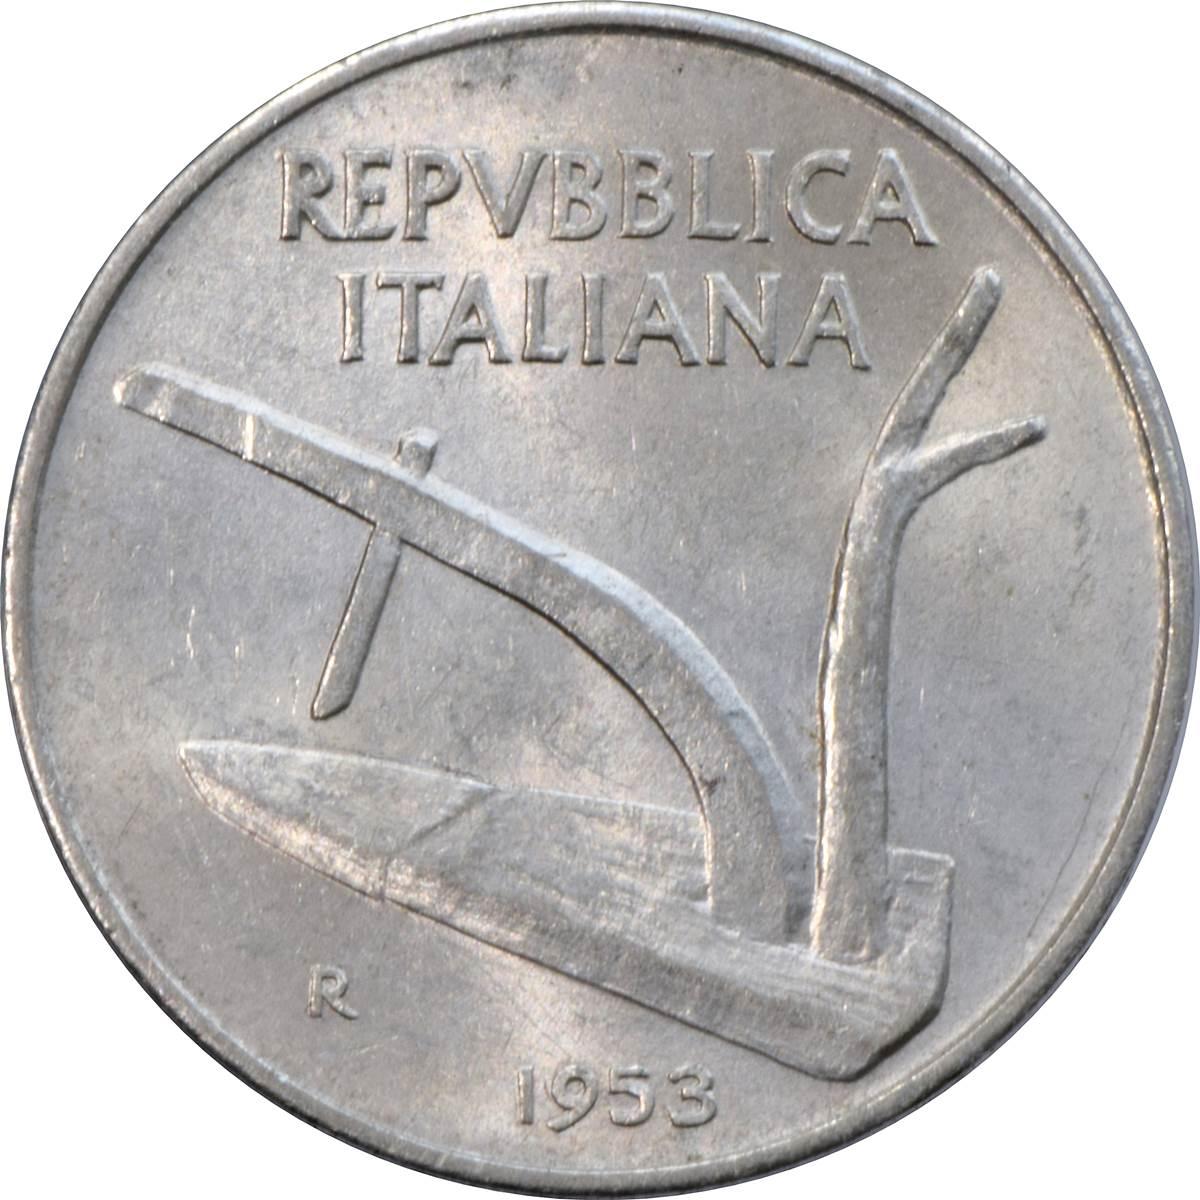 10 Lire - Italy – Numista